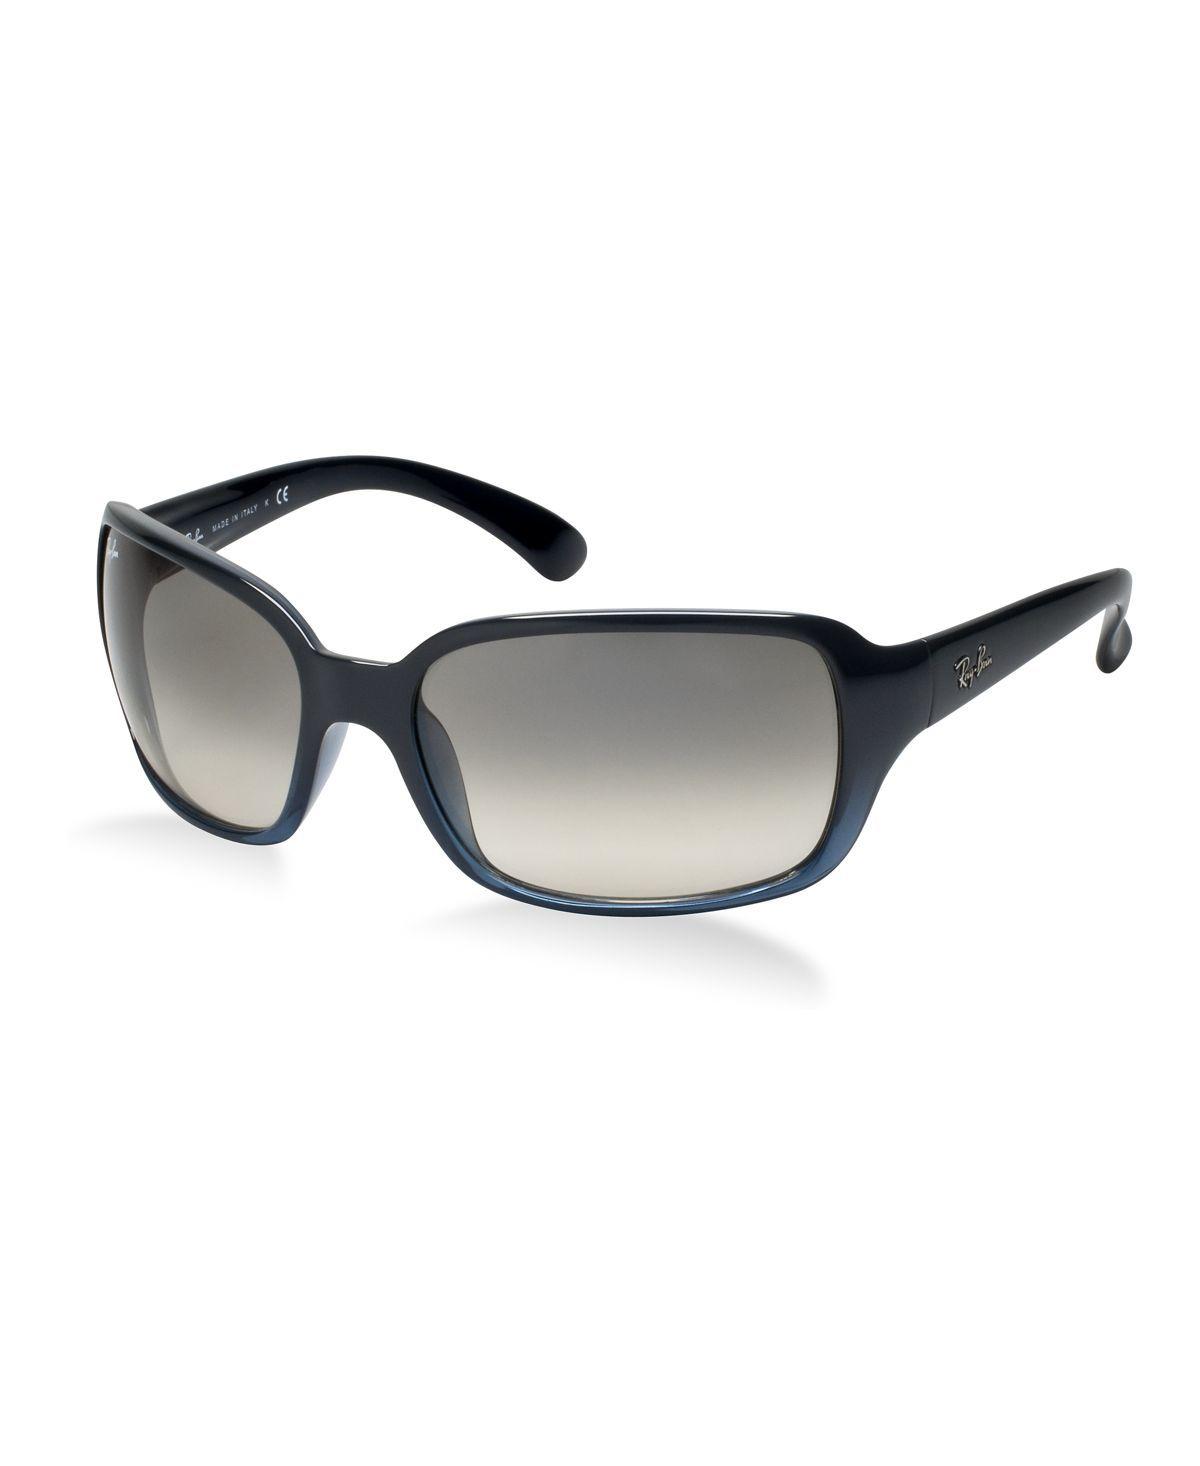 Ray-Ban Sunglasses, RB4068